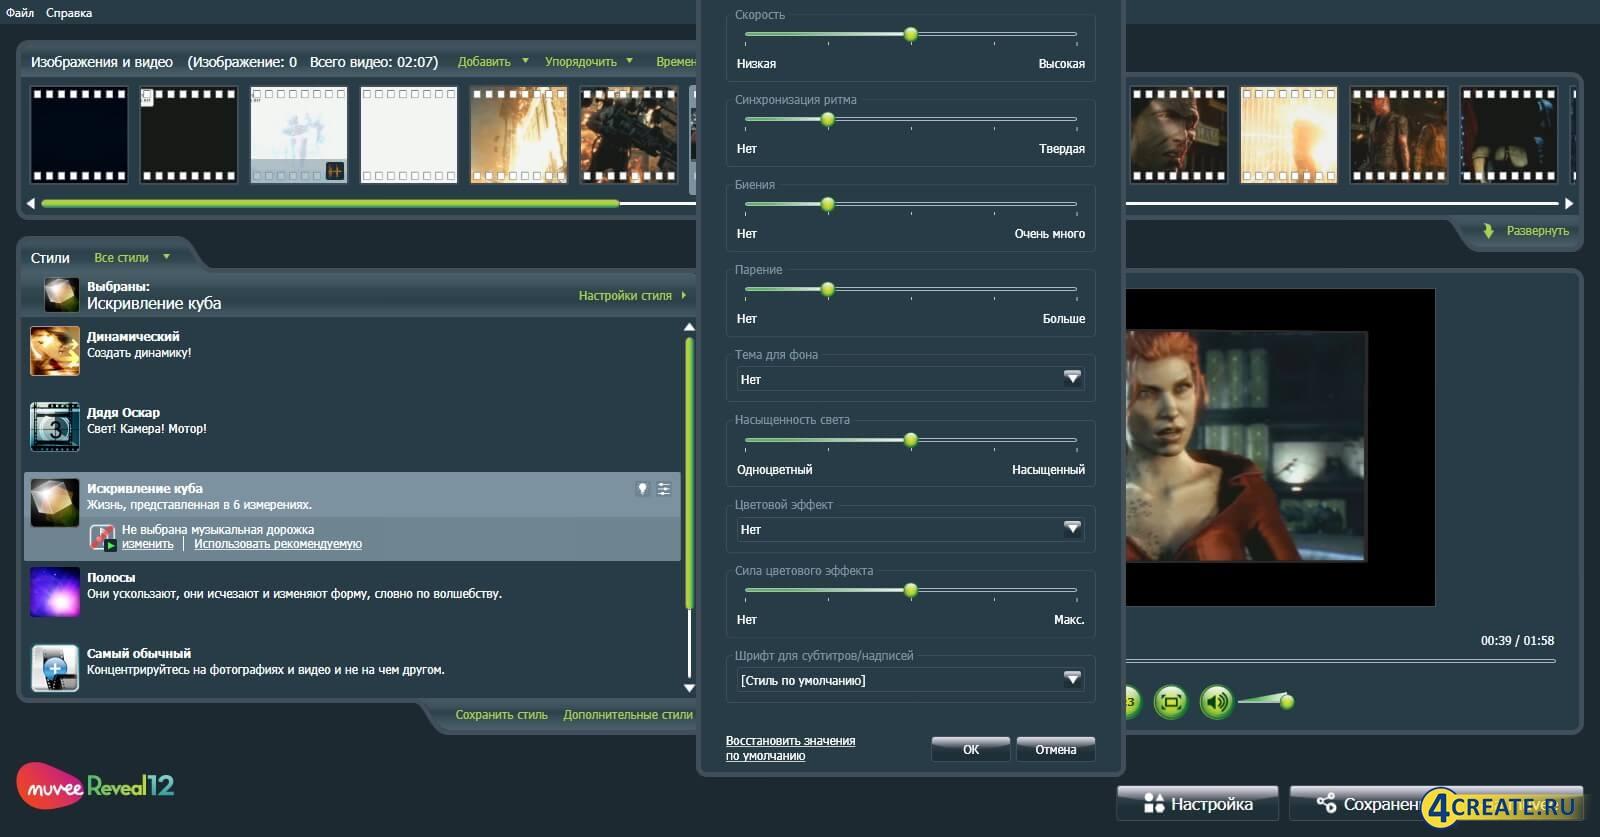 muvee Reveal 12 (Скриншот 3)